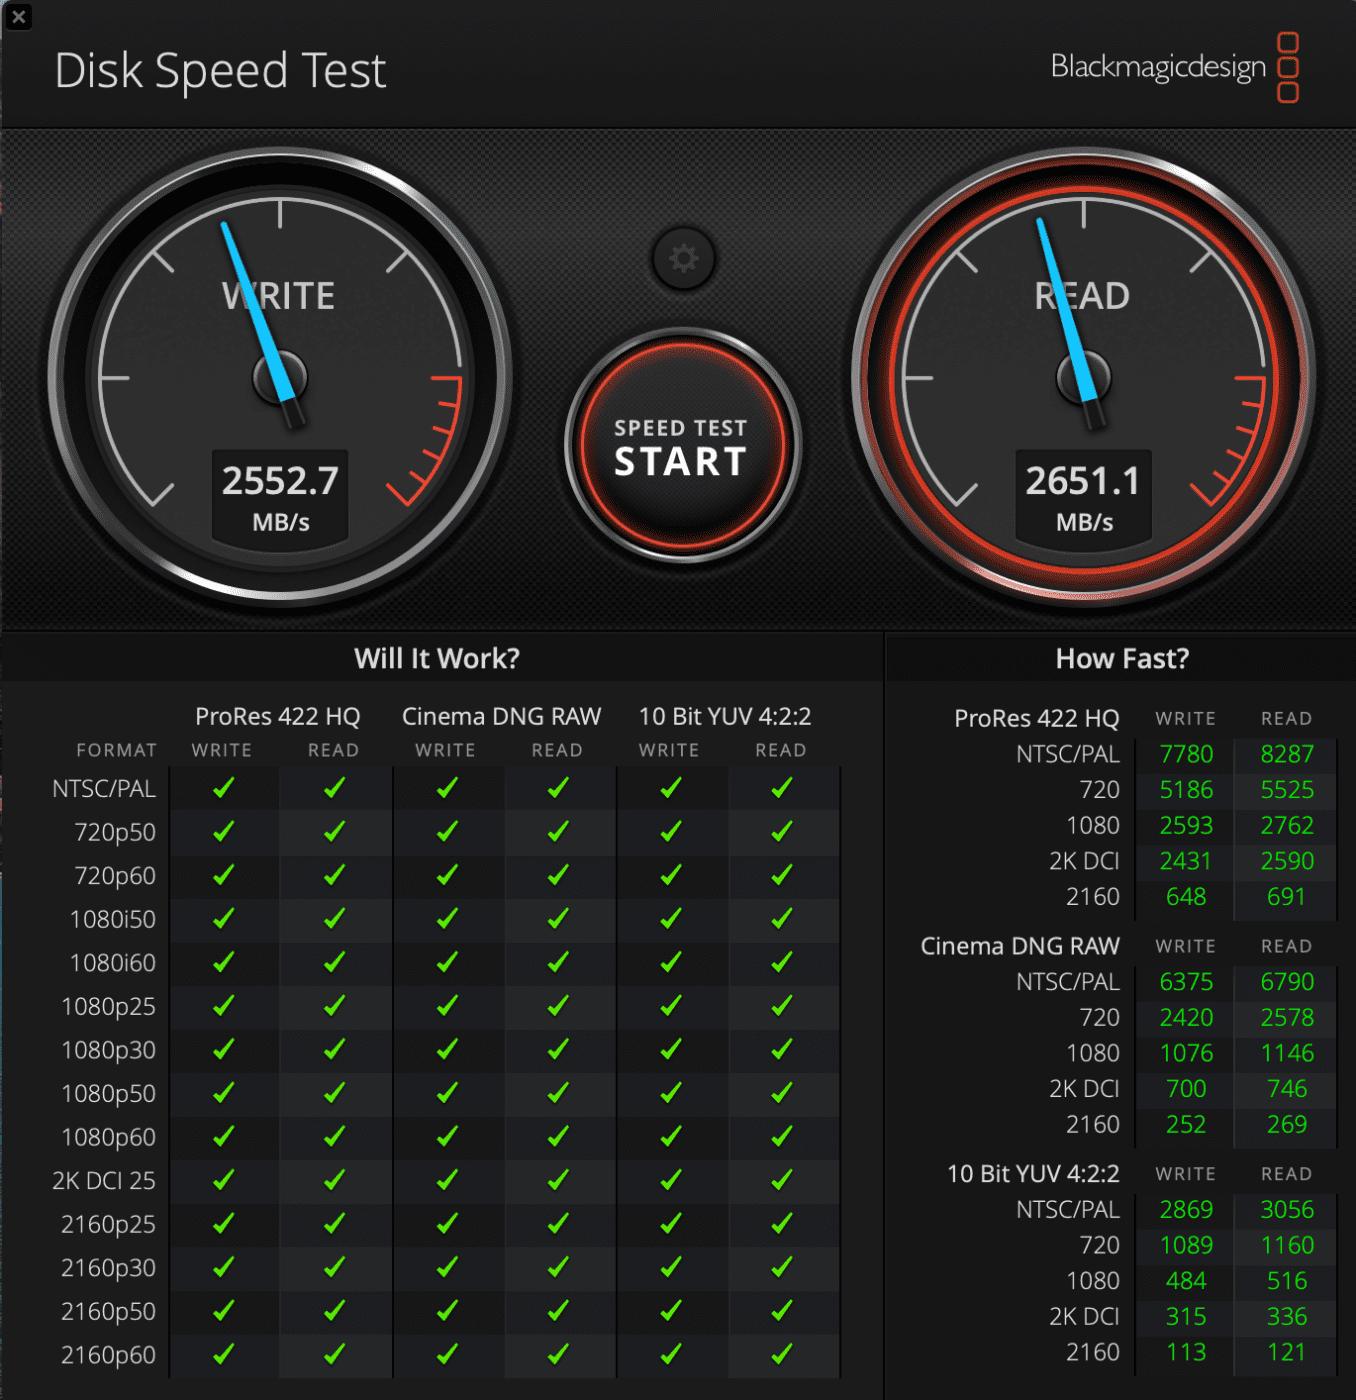 Video Test M1 Air Beats 16 Inch Macbook Pro